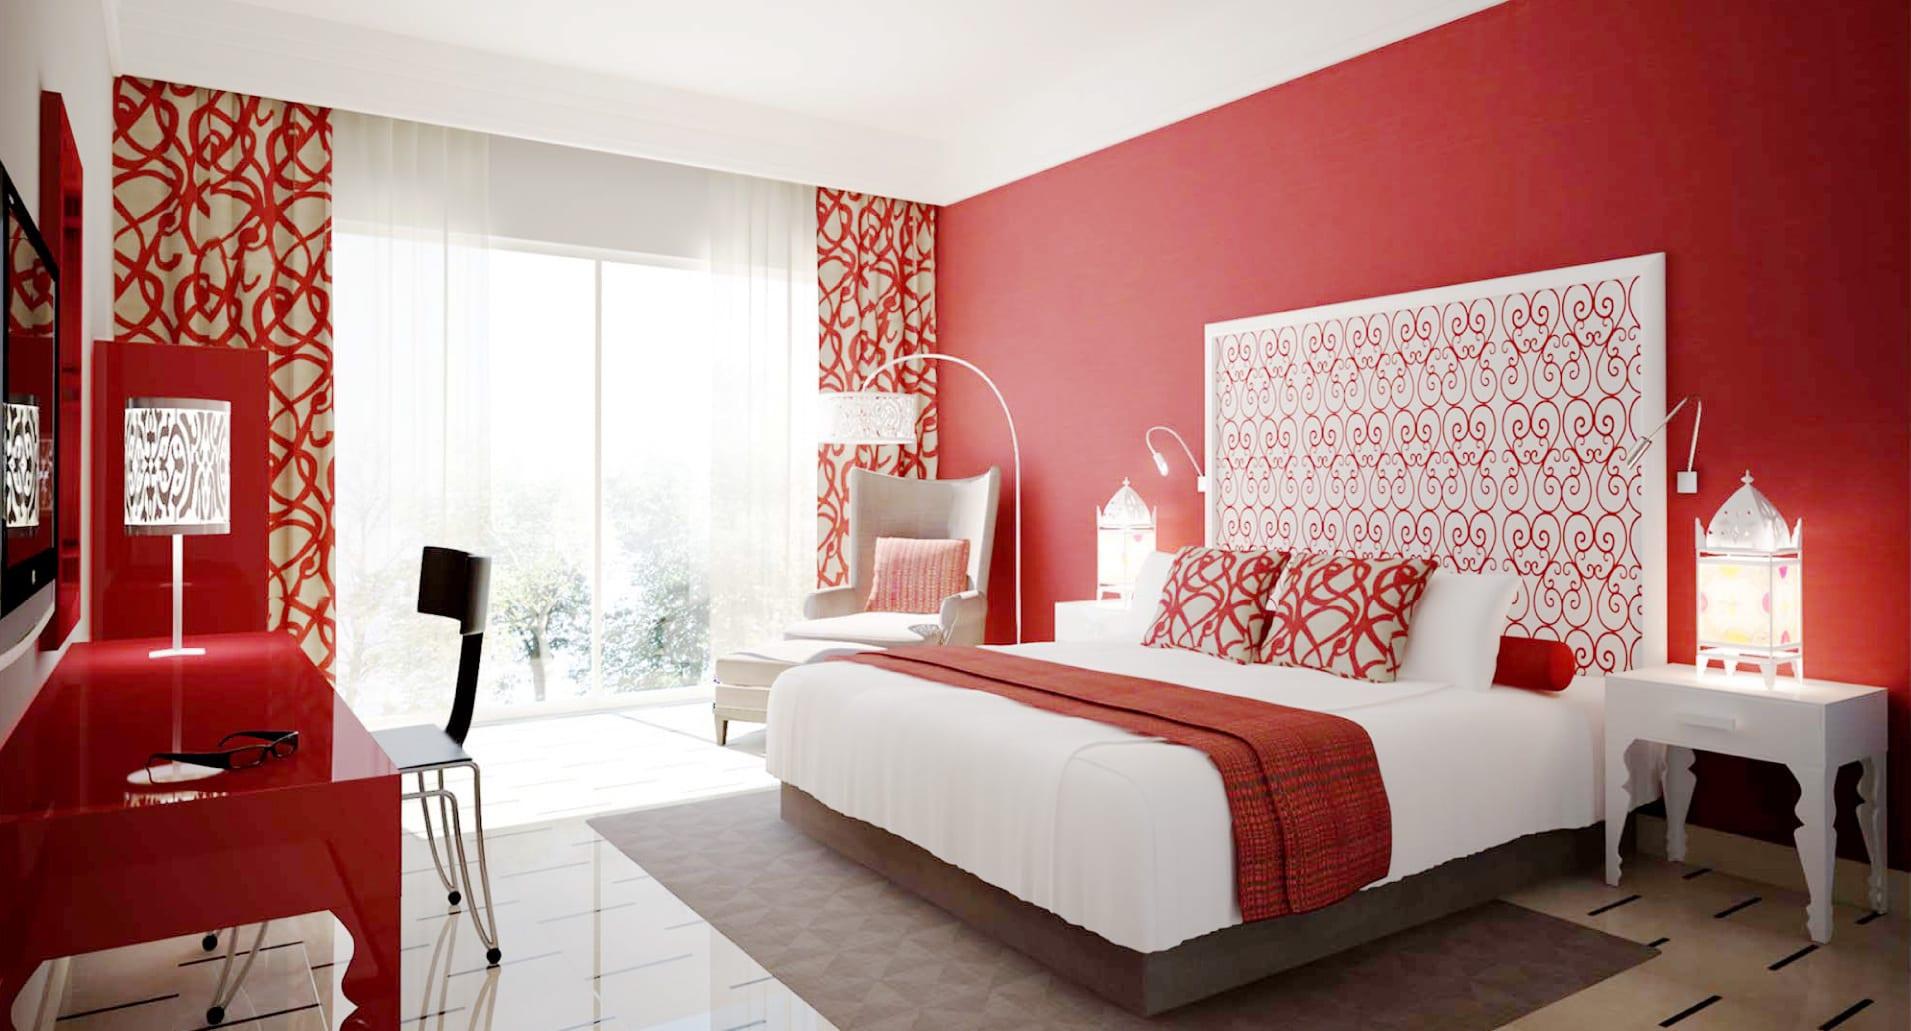 Schlafzimmer Rot - 17 Schlafzimmer Inspirationen in rot - fresHouse